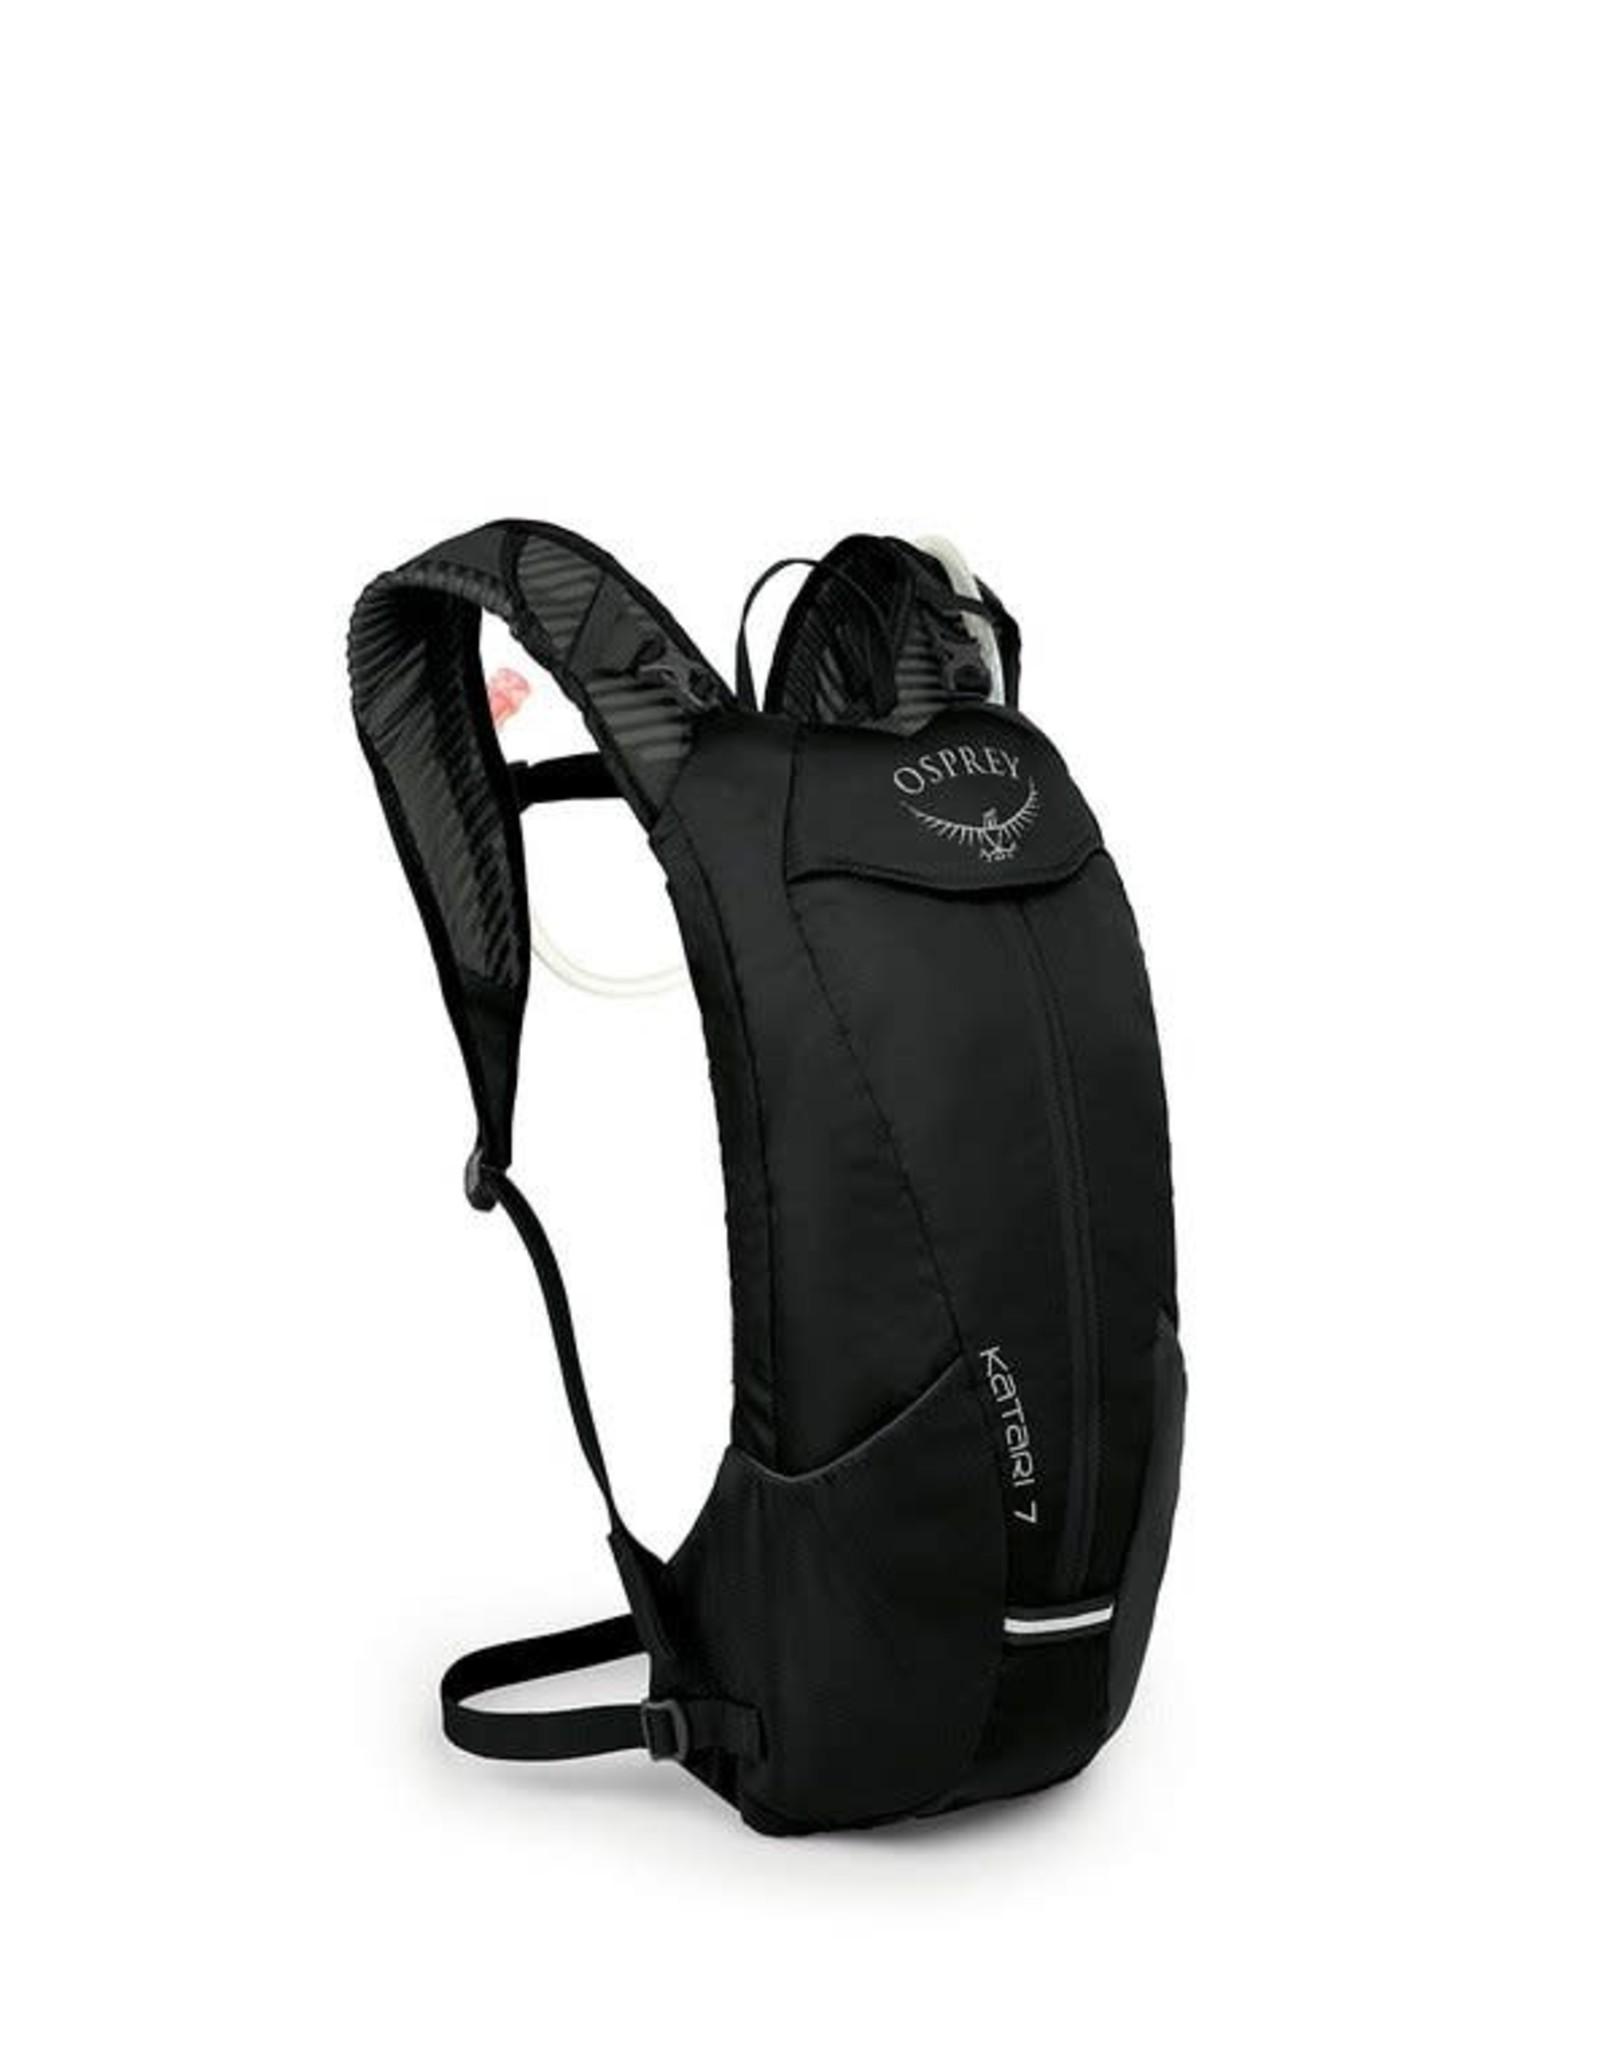 Osprey Osprey Katari 7 Hydration Pack Black